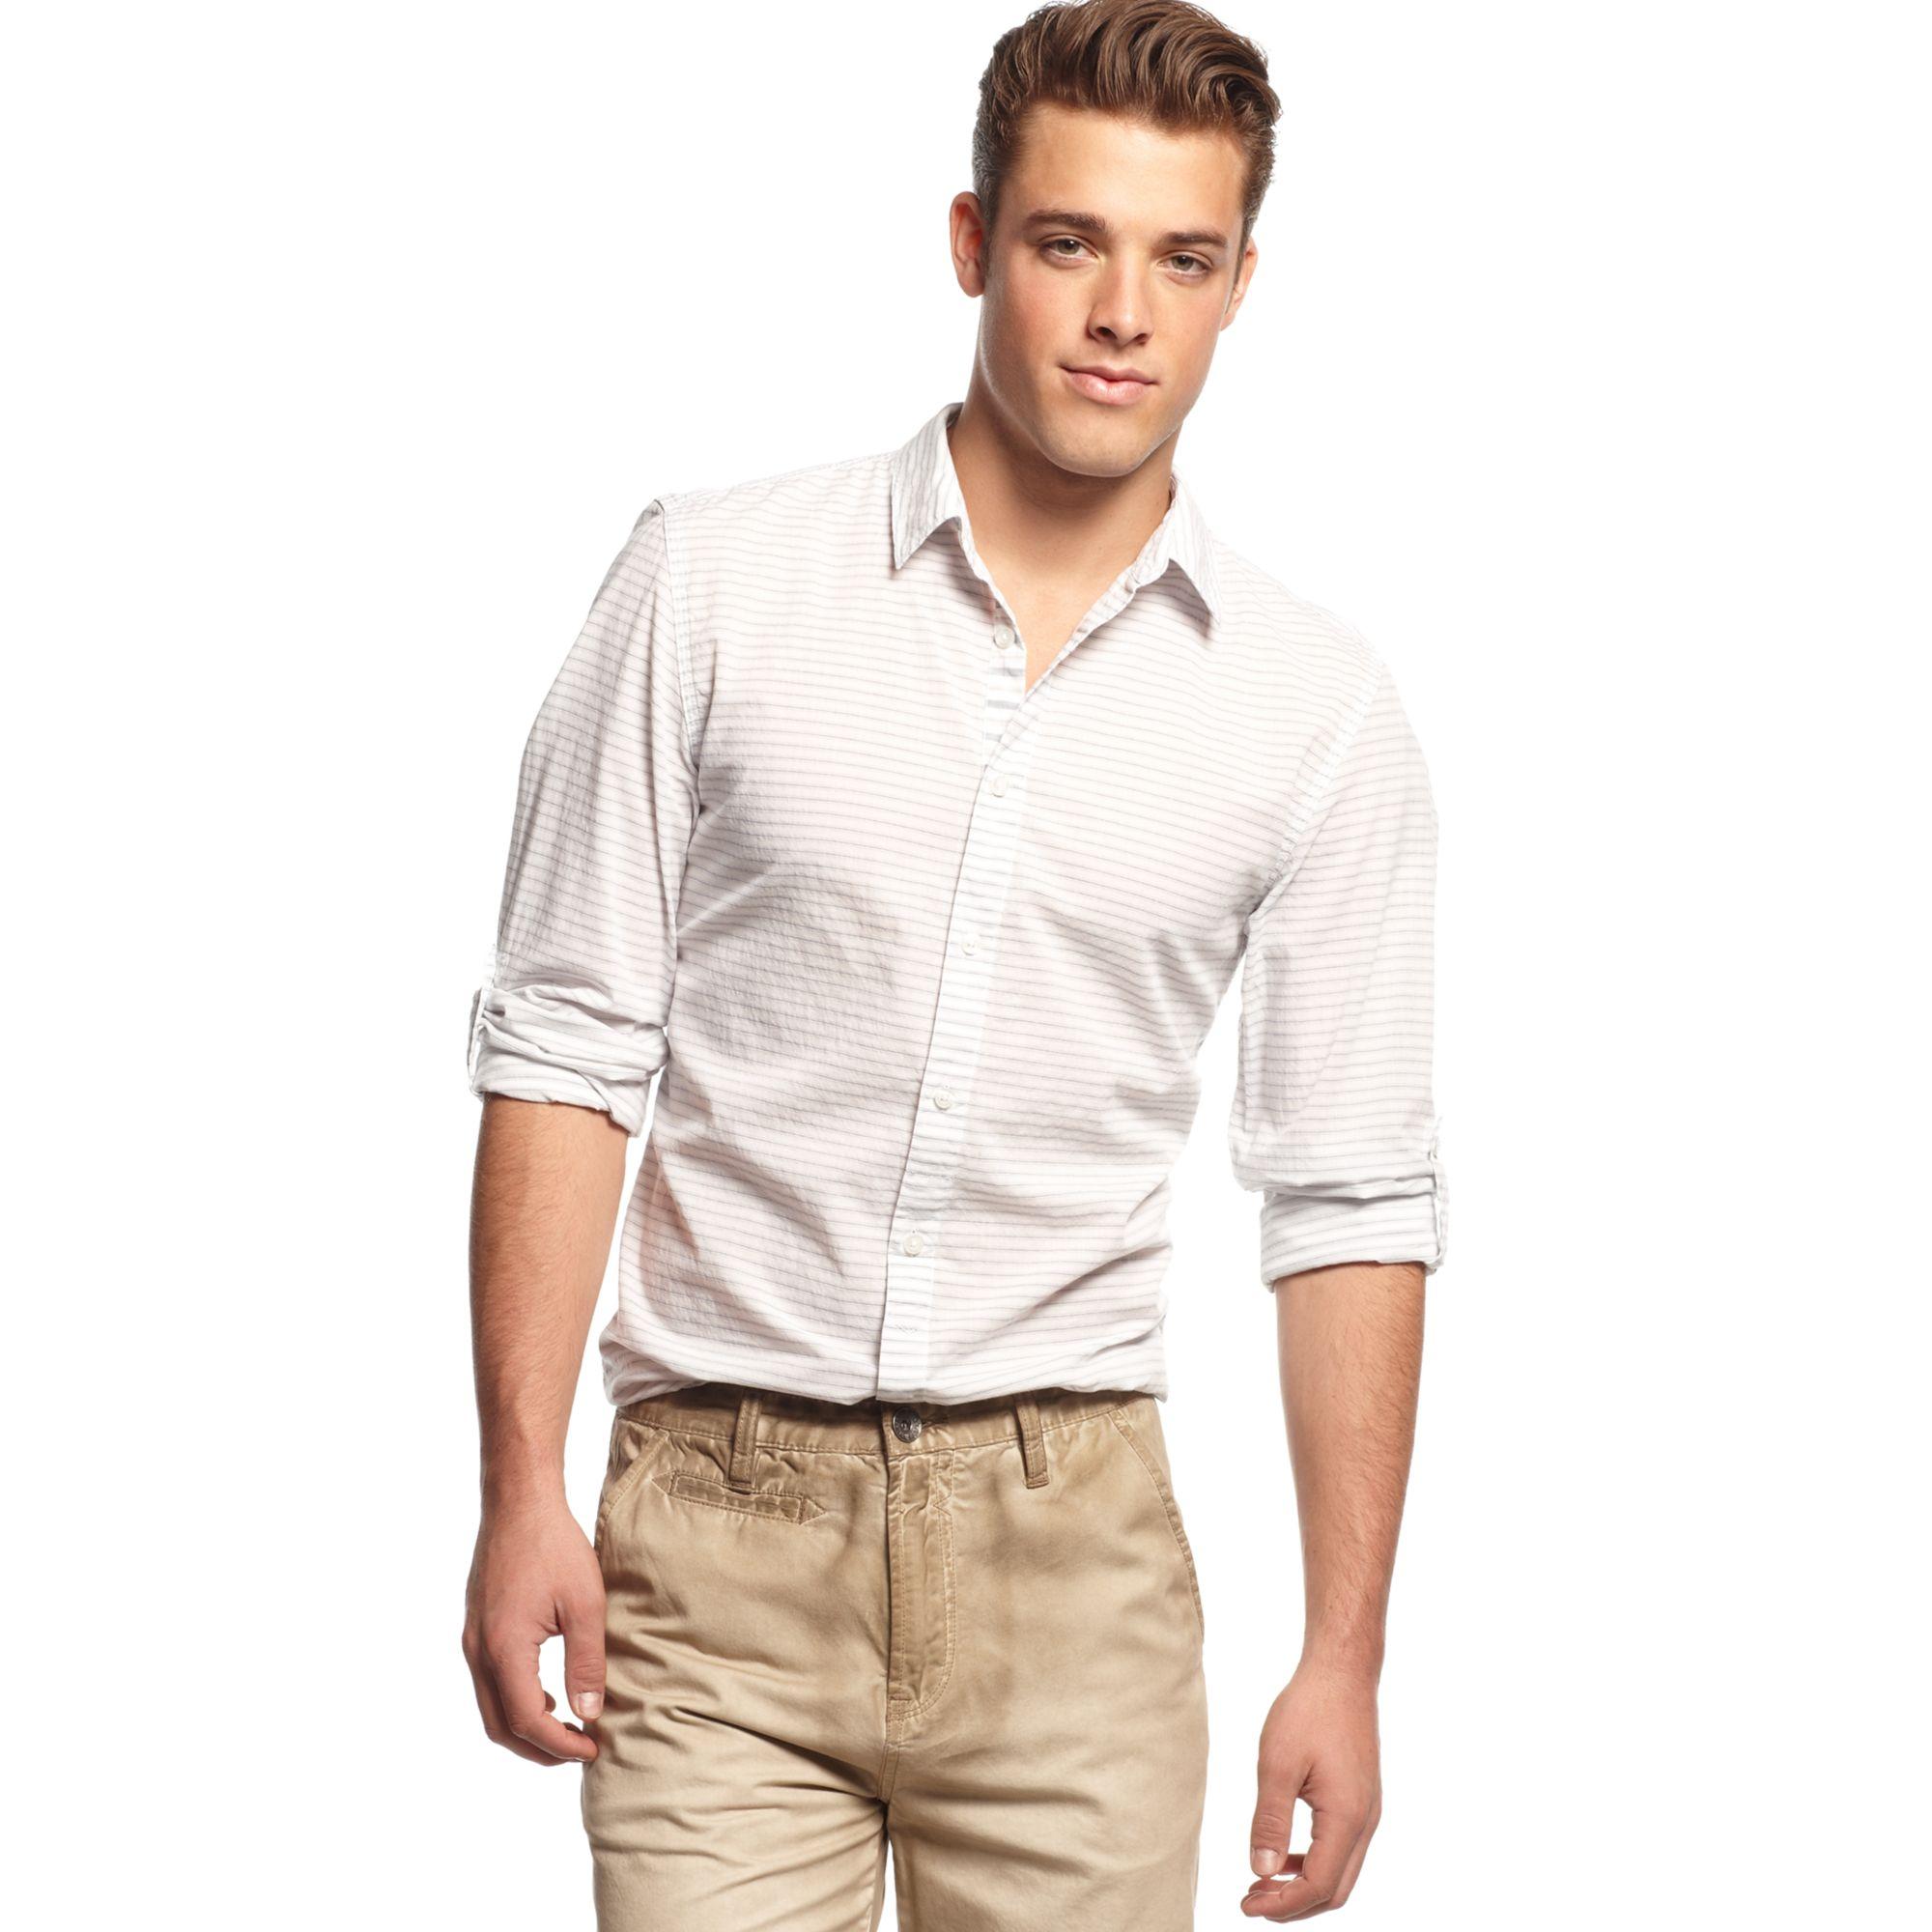 Guess Cove Longsleeve Shirt In White For Men Optic White